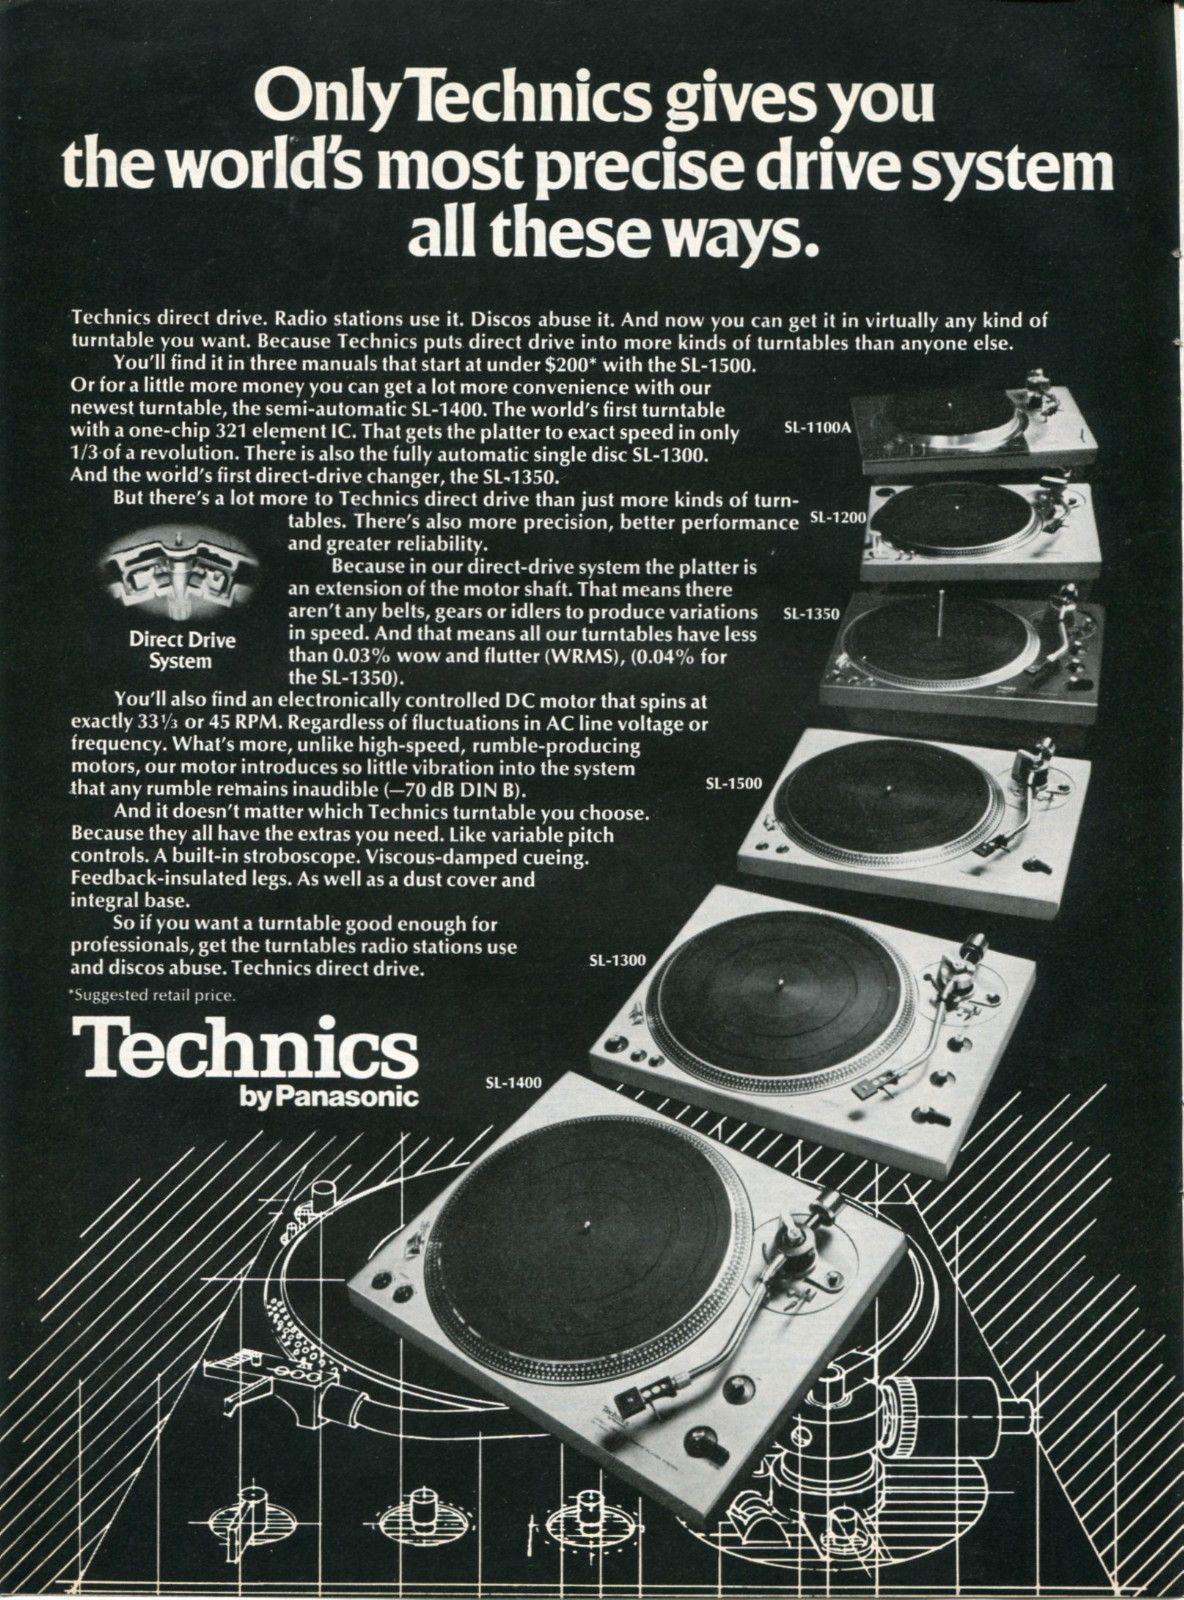 1976 Panasonic Technics Direct Drive Dj Turntables Retro